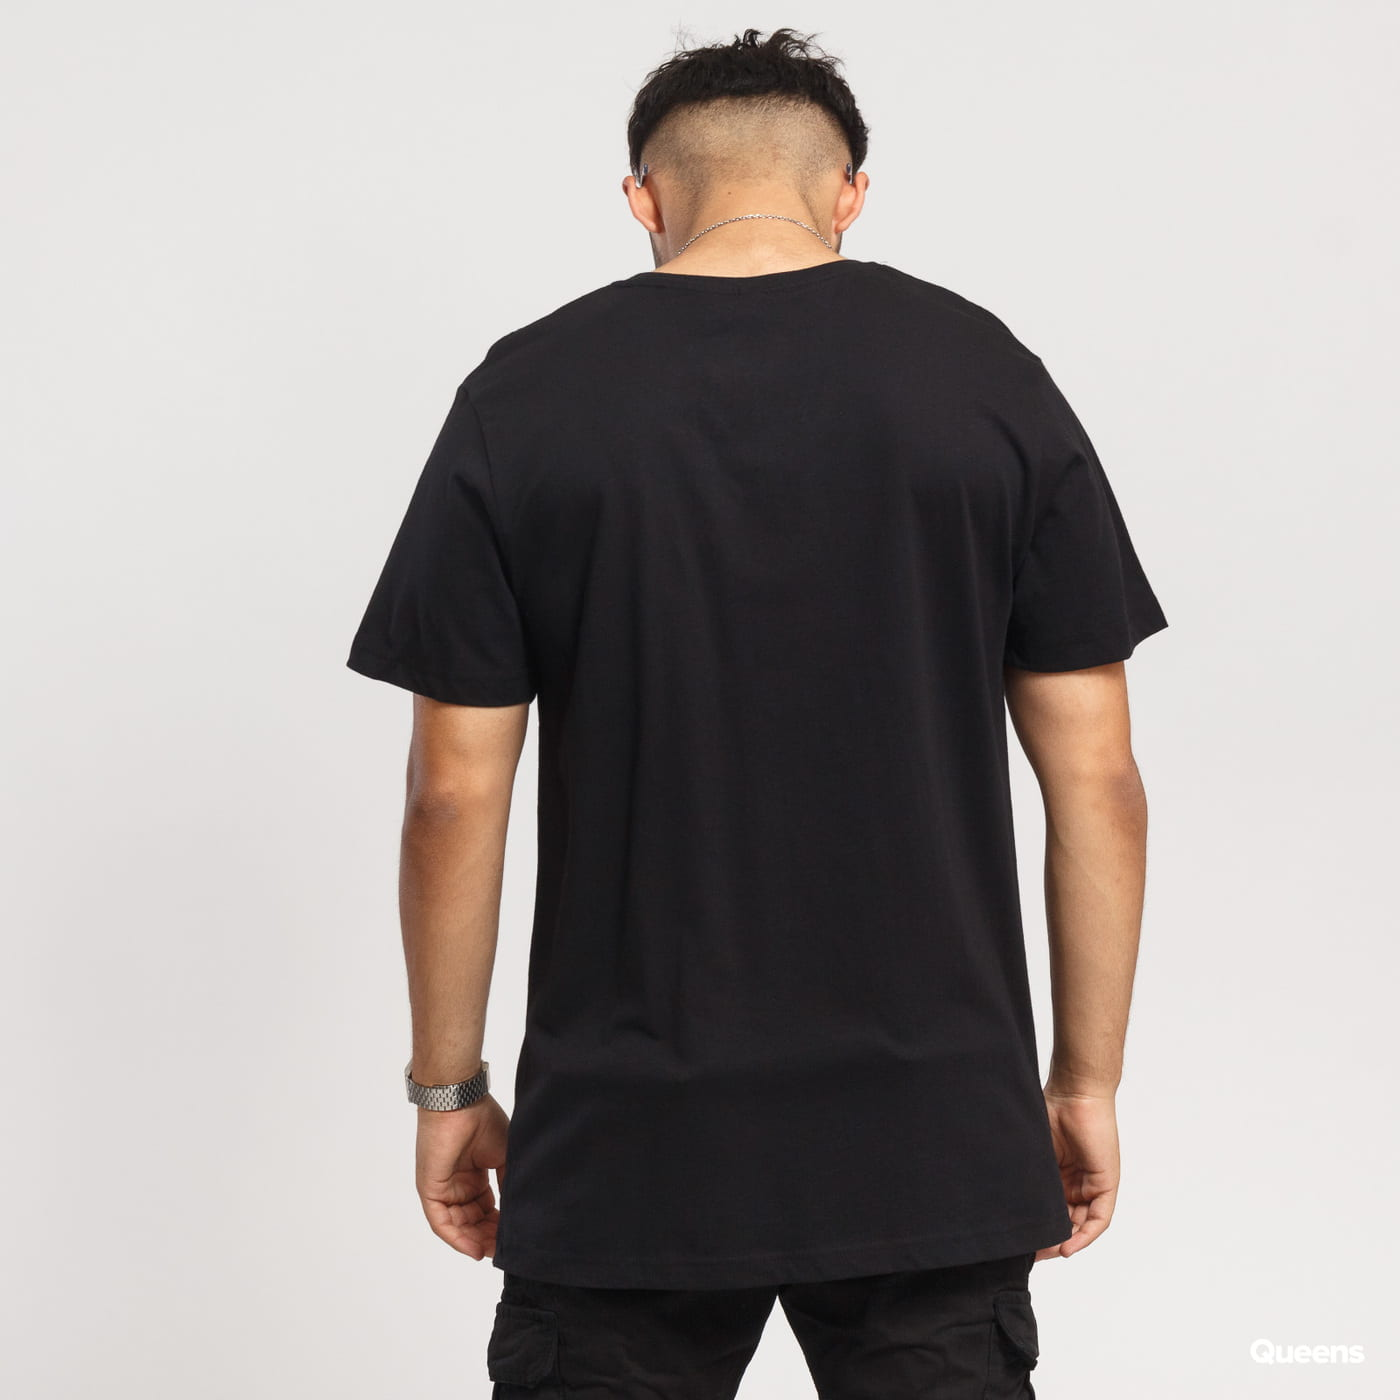 Urban Classics Ice Cube Raiders black